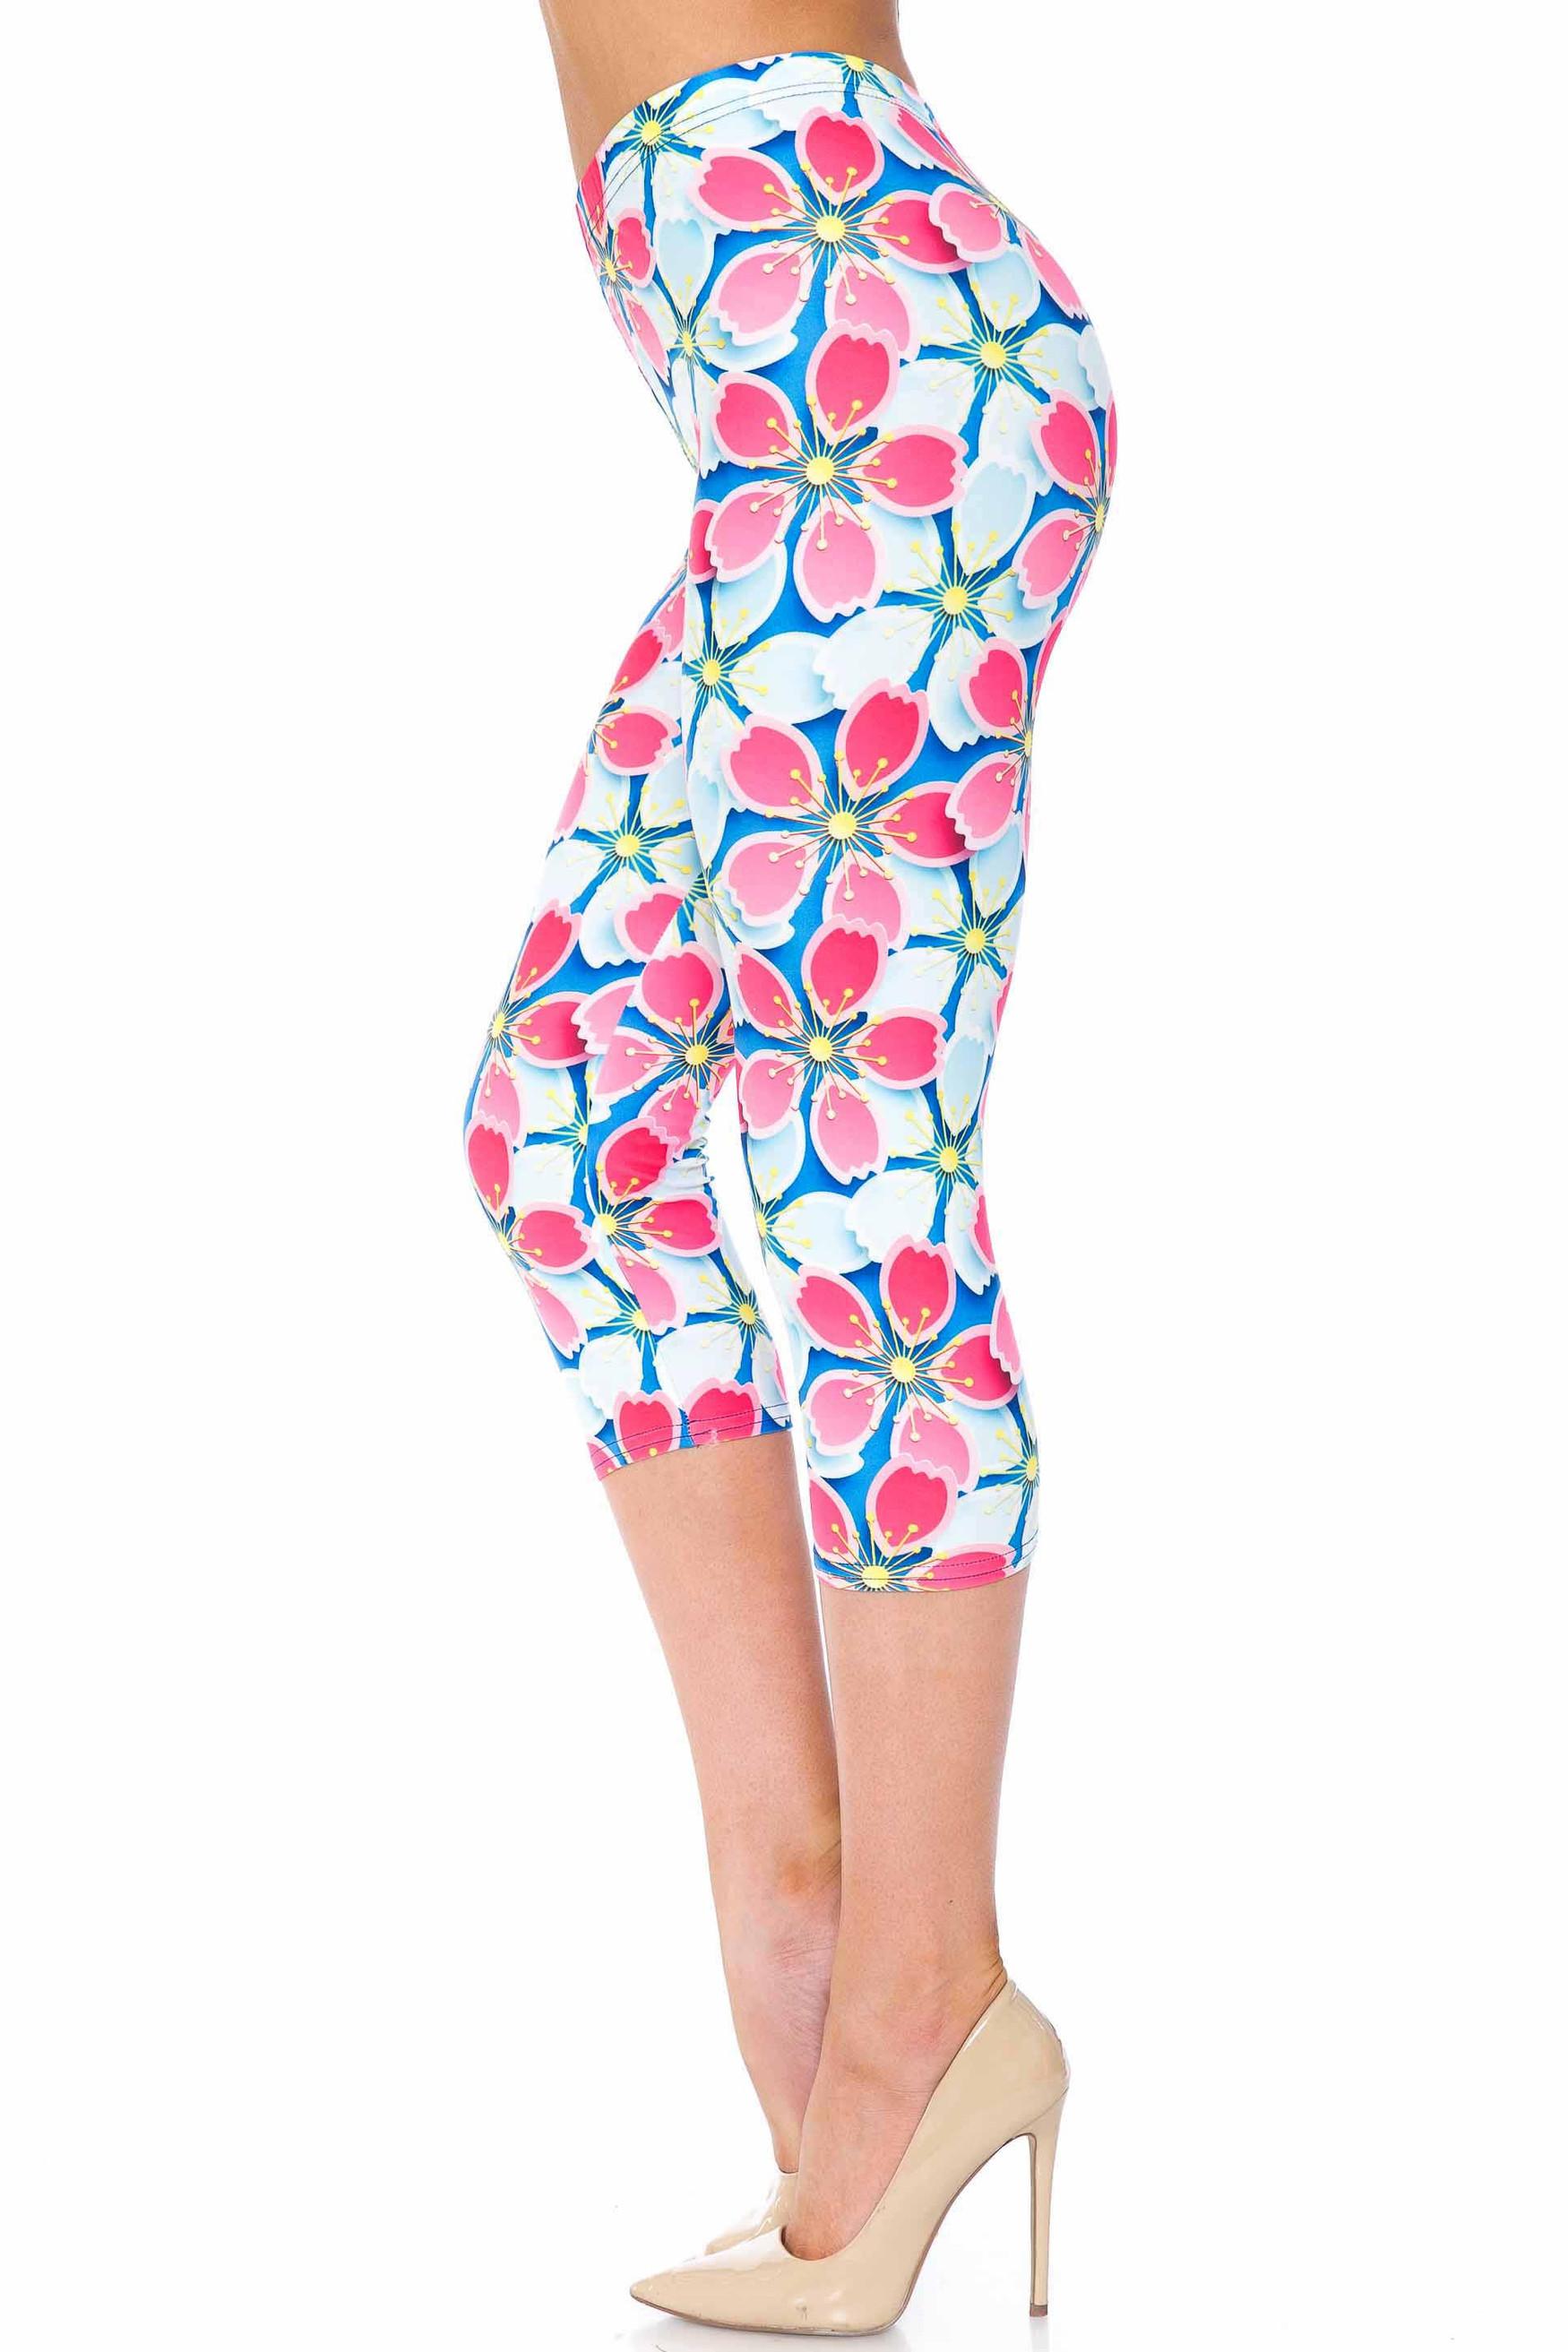 Creamy Soft Pink and Blue Sunshine Floral Plus Size Capris - USA Fashion™